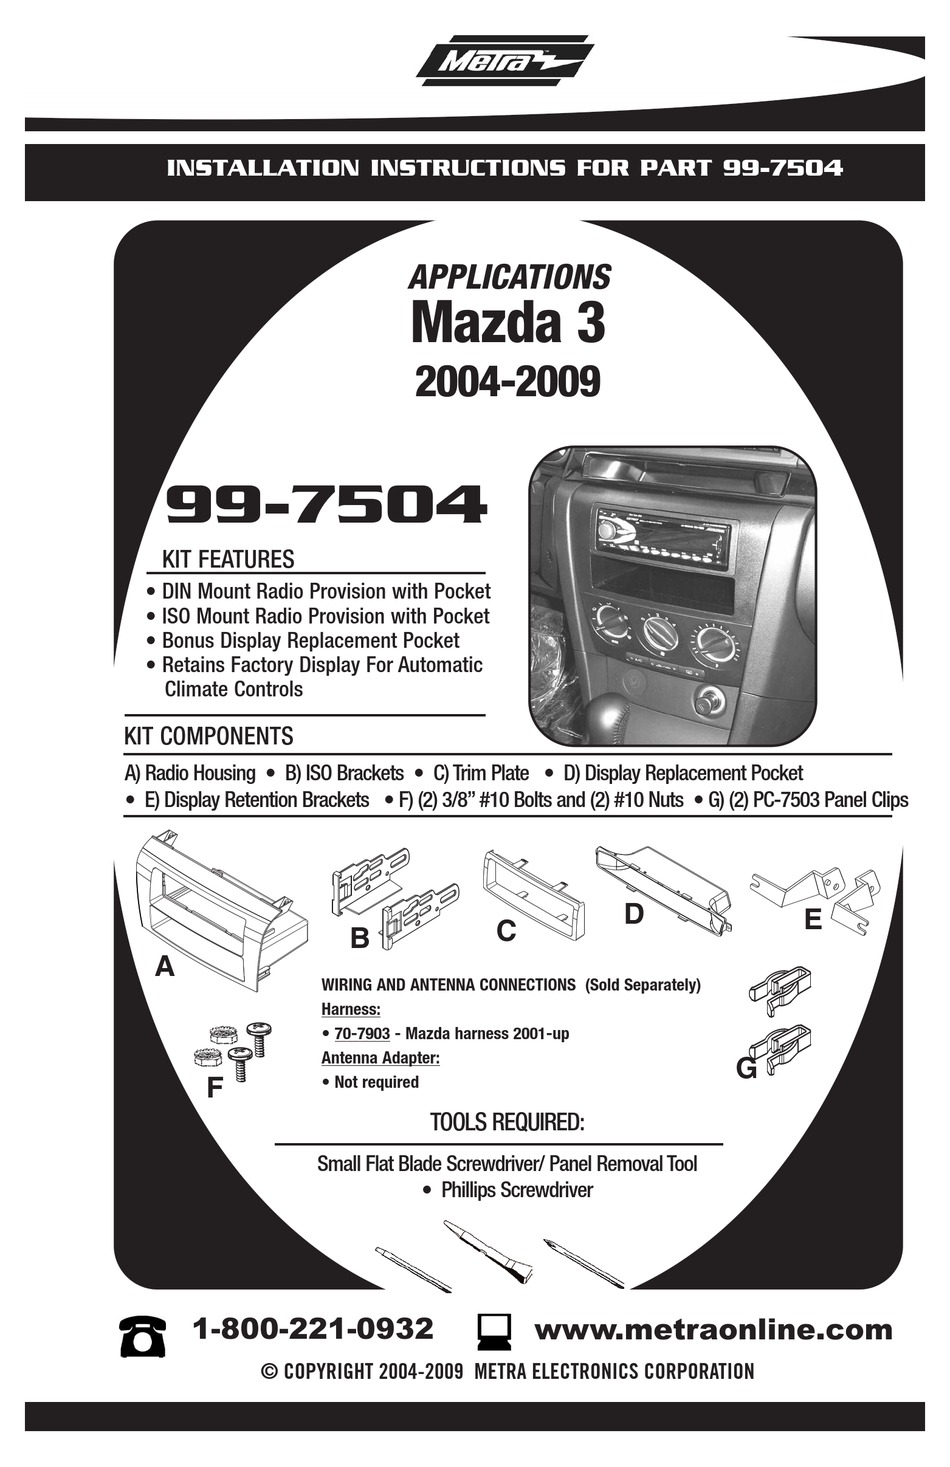 METRA ELECTRONICS 99-7504 INSTALLATION INSTRUCTIONS MANUAL